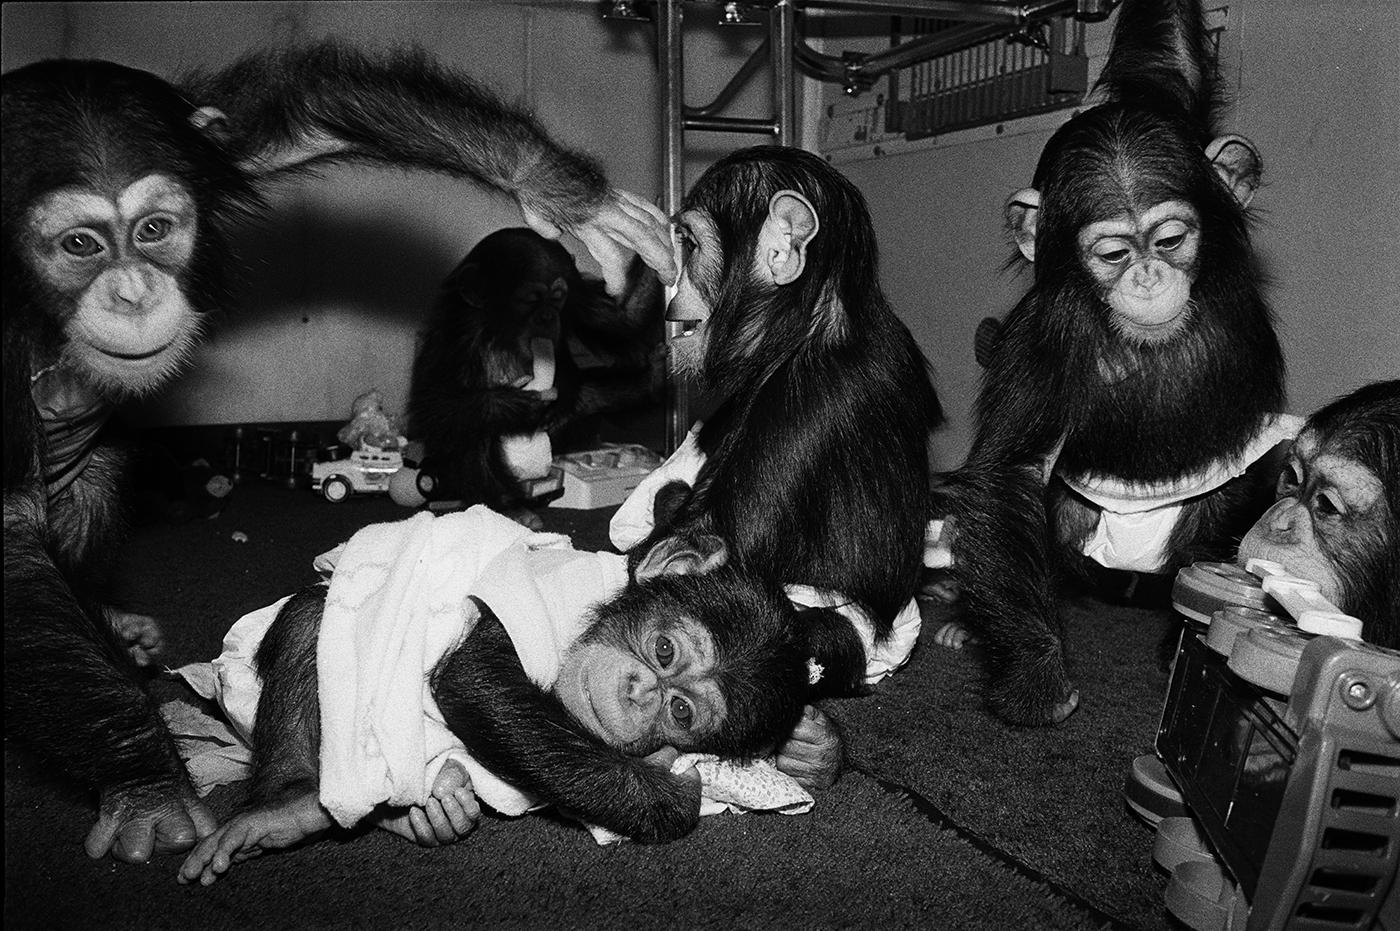 Josh, Hermonie, Alexis, Rene and Ewok, 1988. Chimpanzees, all under 1 year old.